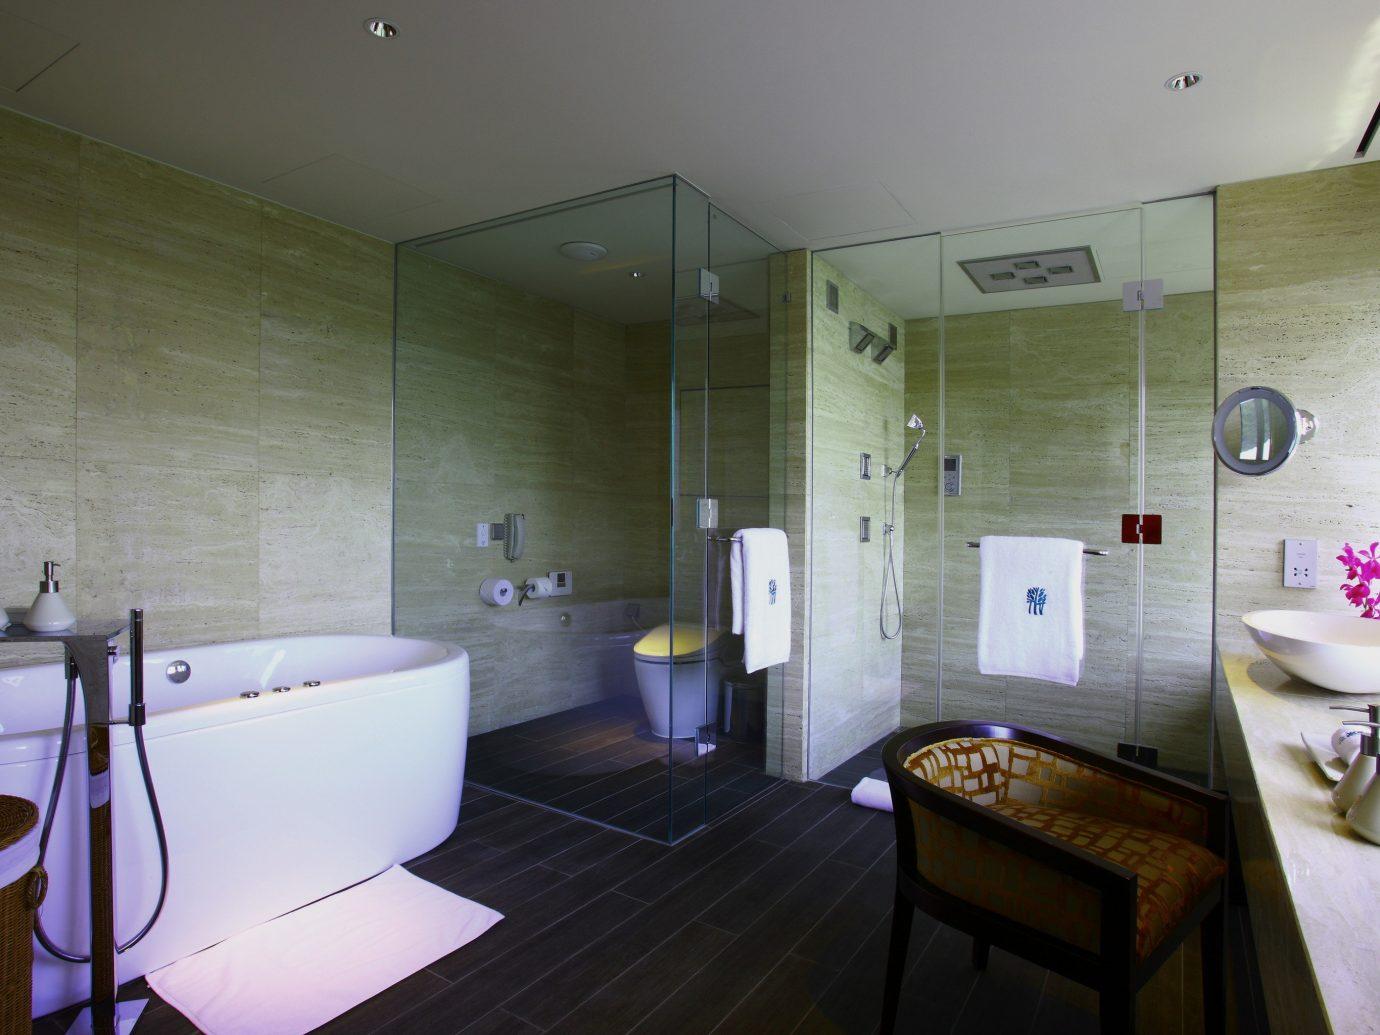 Hotels Luxury Travel indoor wall floor bathroom room property ceiling interior design home estate Design Suite apartment area Bedroom furniture